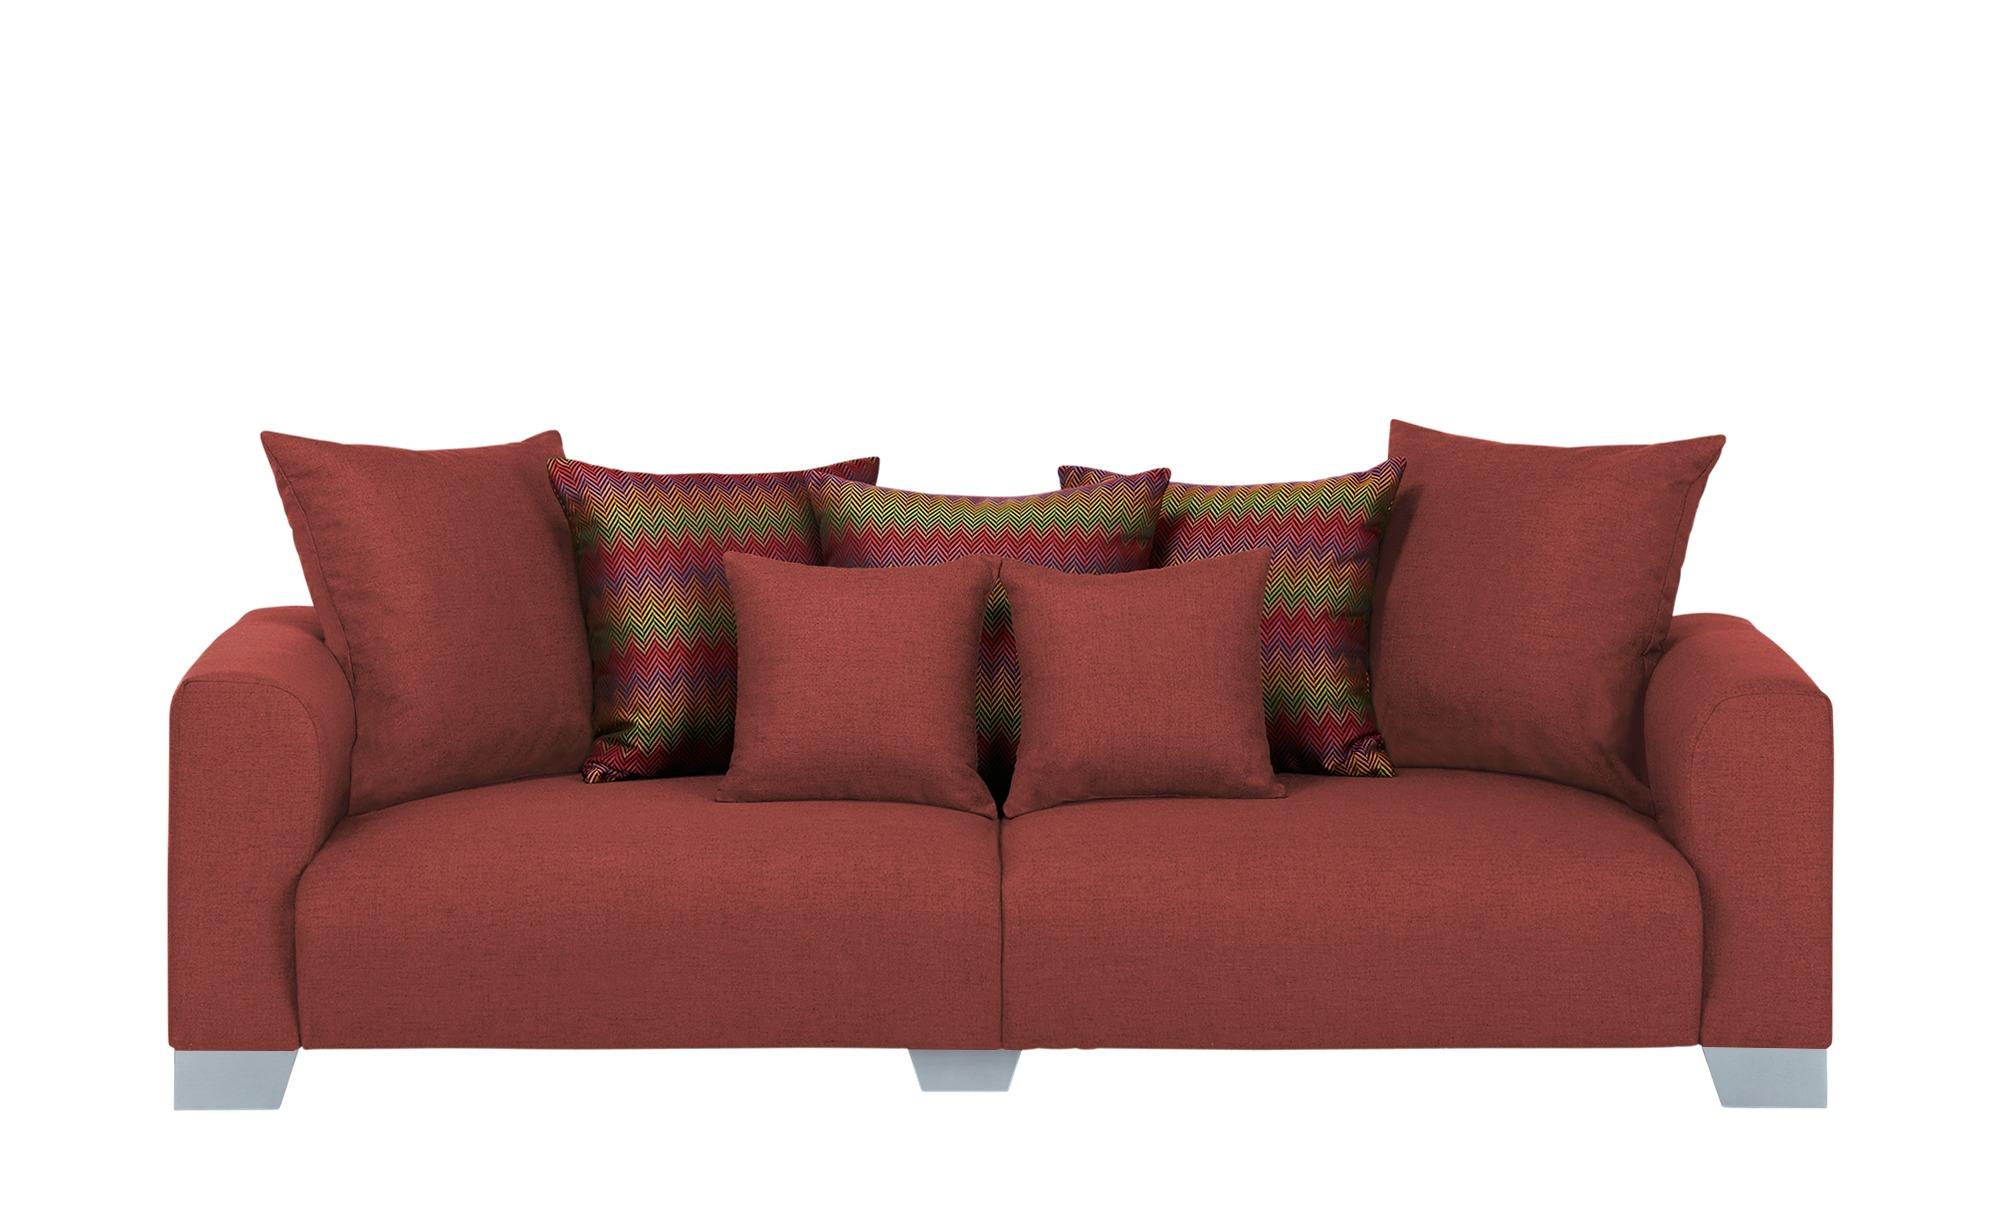 smart Big Sofa  Tonja ¦ rot ¦ Maße (cm): B: 244 H: 68 T: 107 Polstermöbel > Sofas > Big-Sofas - Höffner